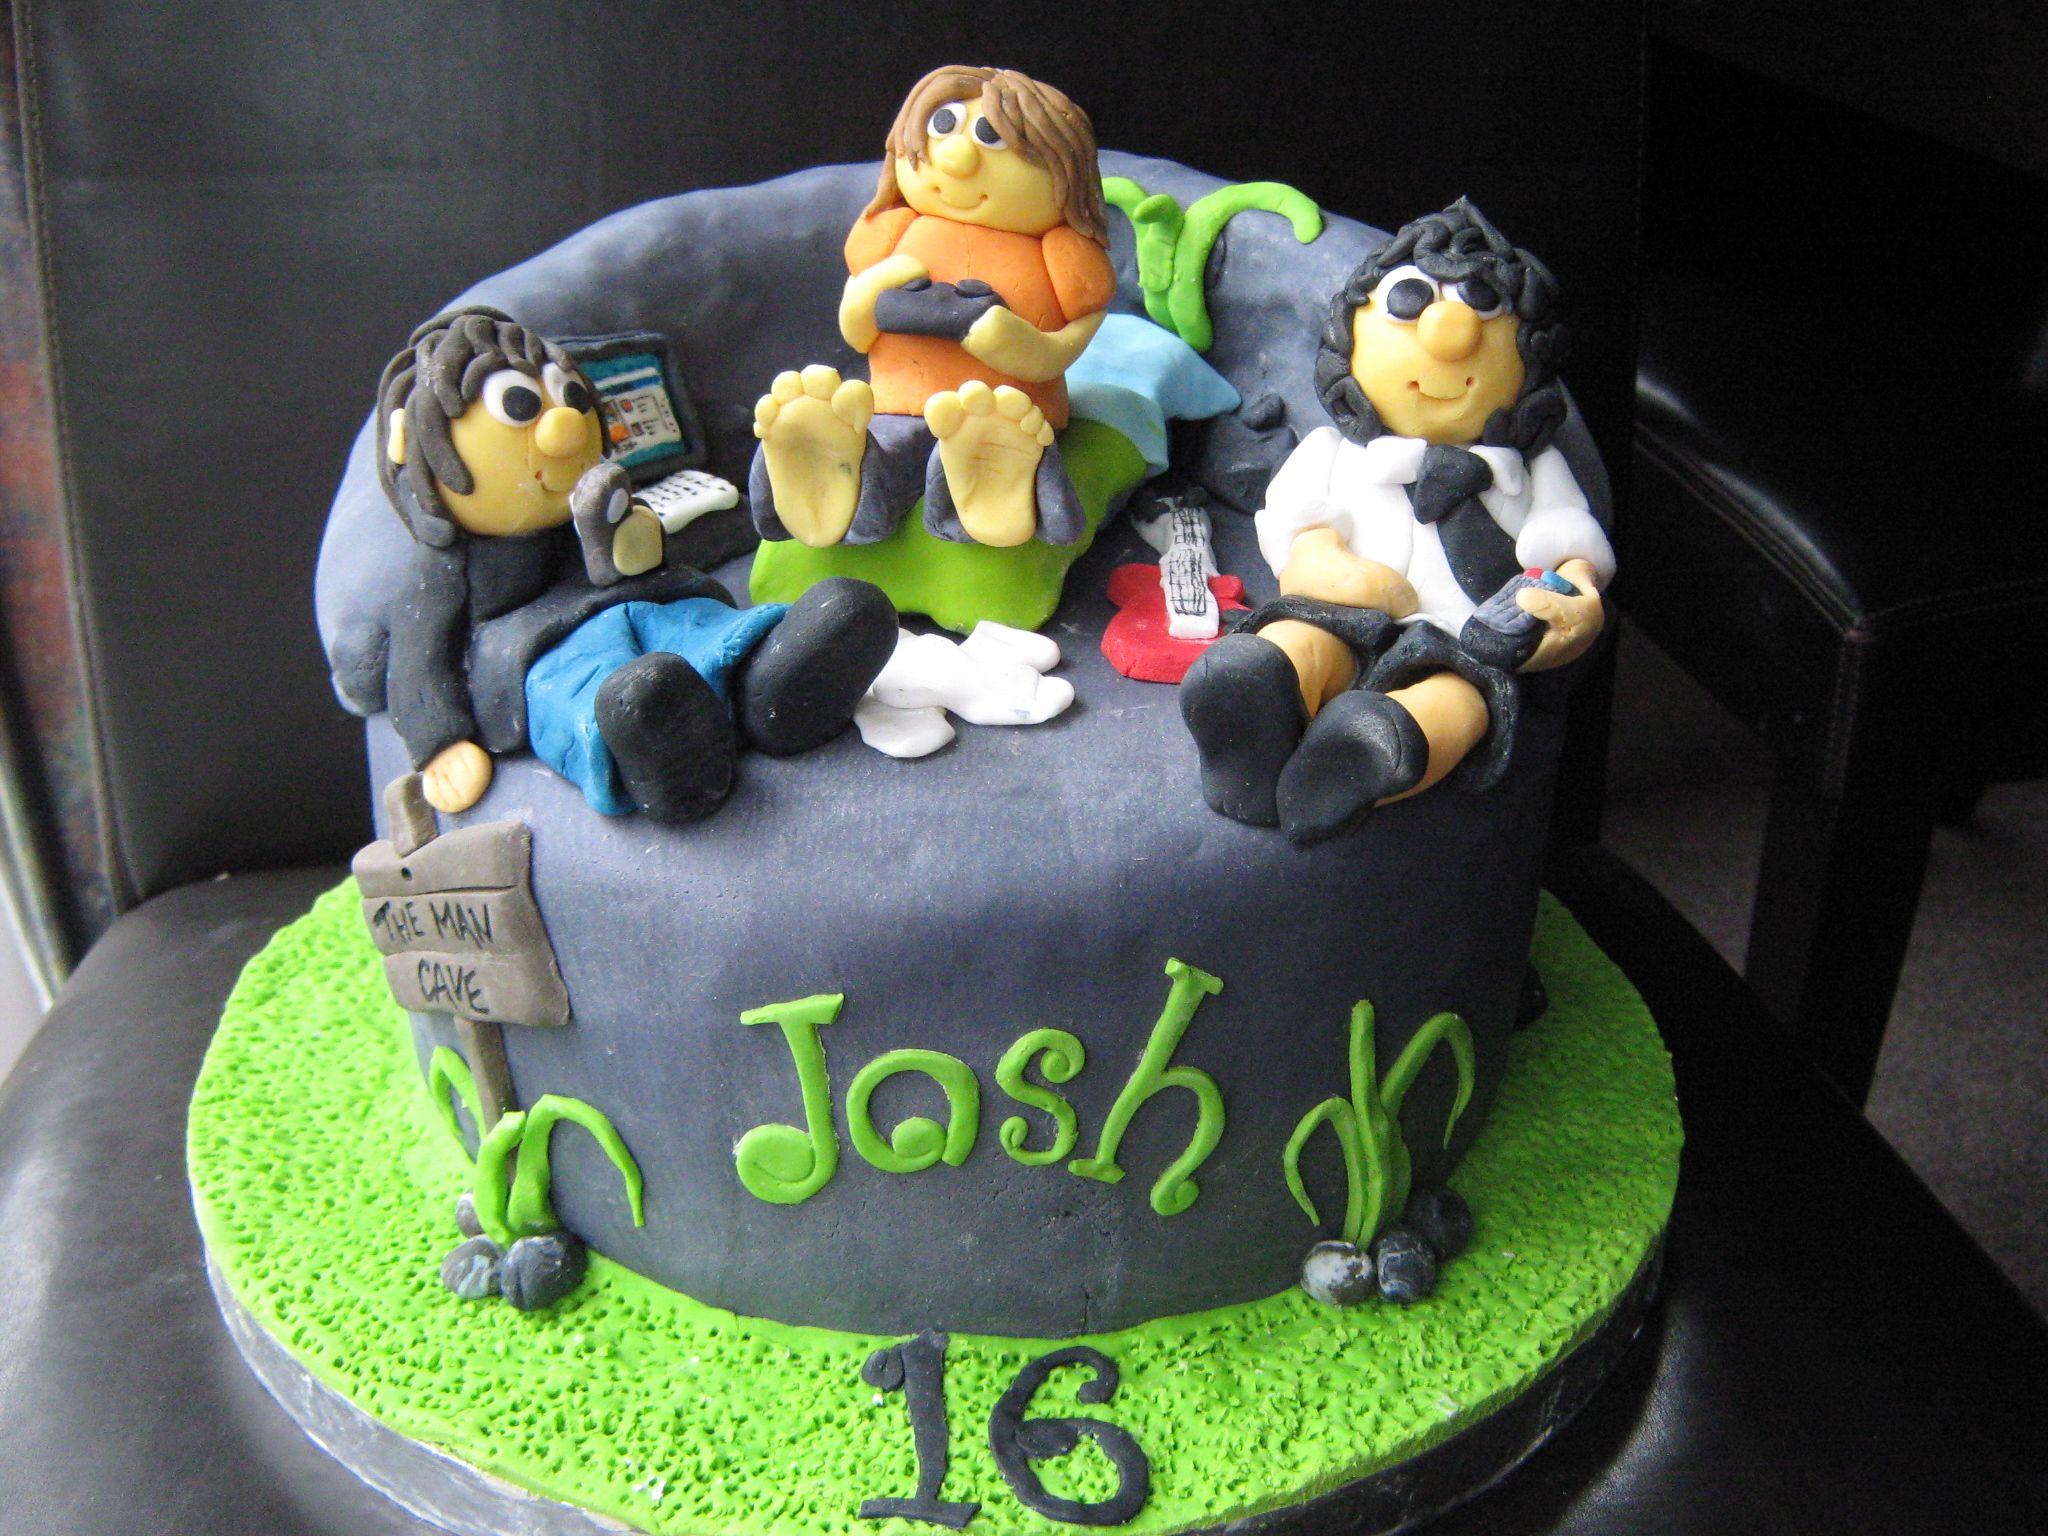 16th Birthday Cakes For Boys 16th Birthday Man Cave Cake